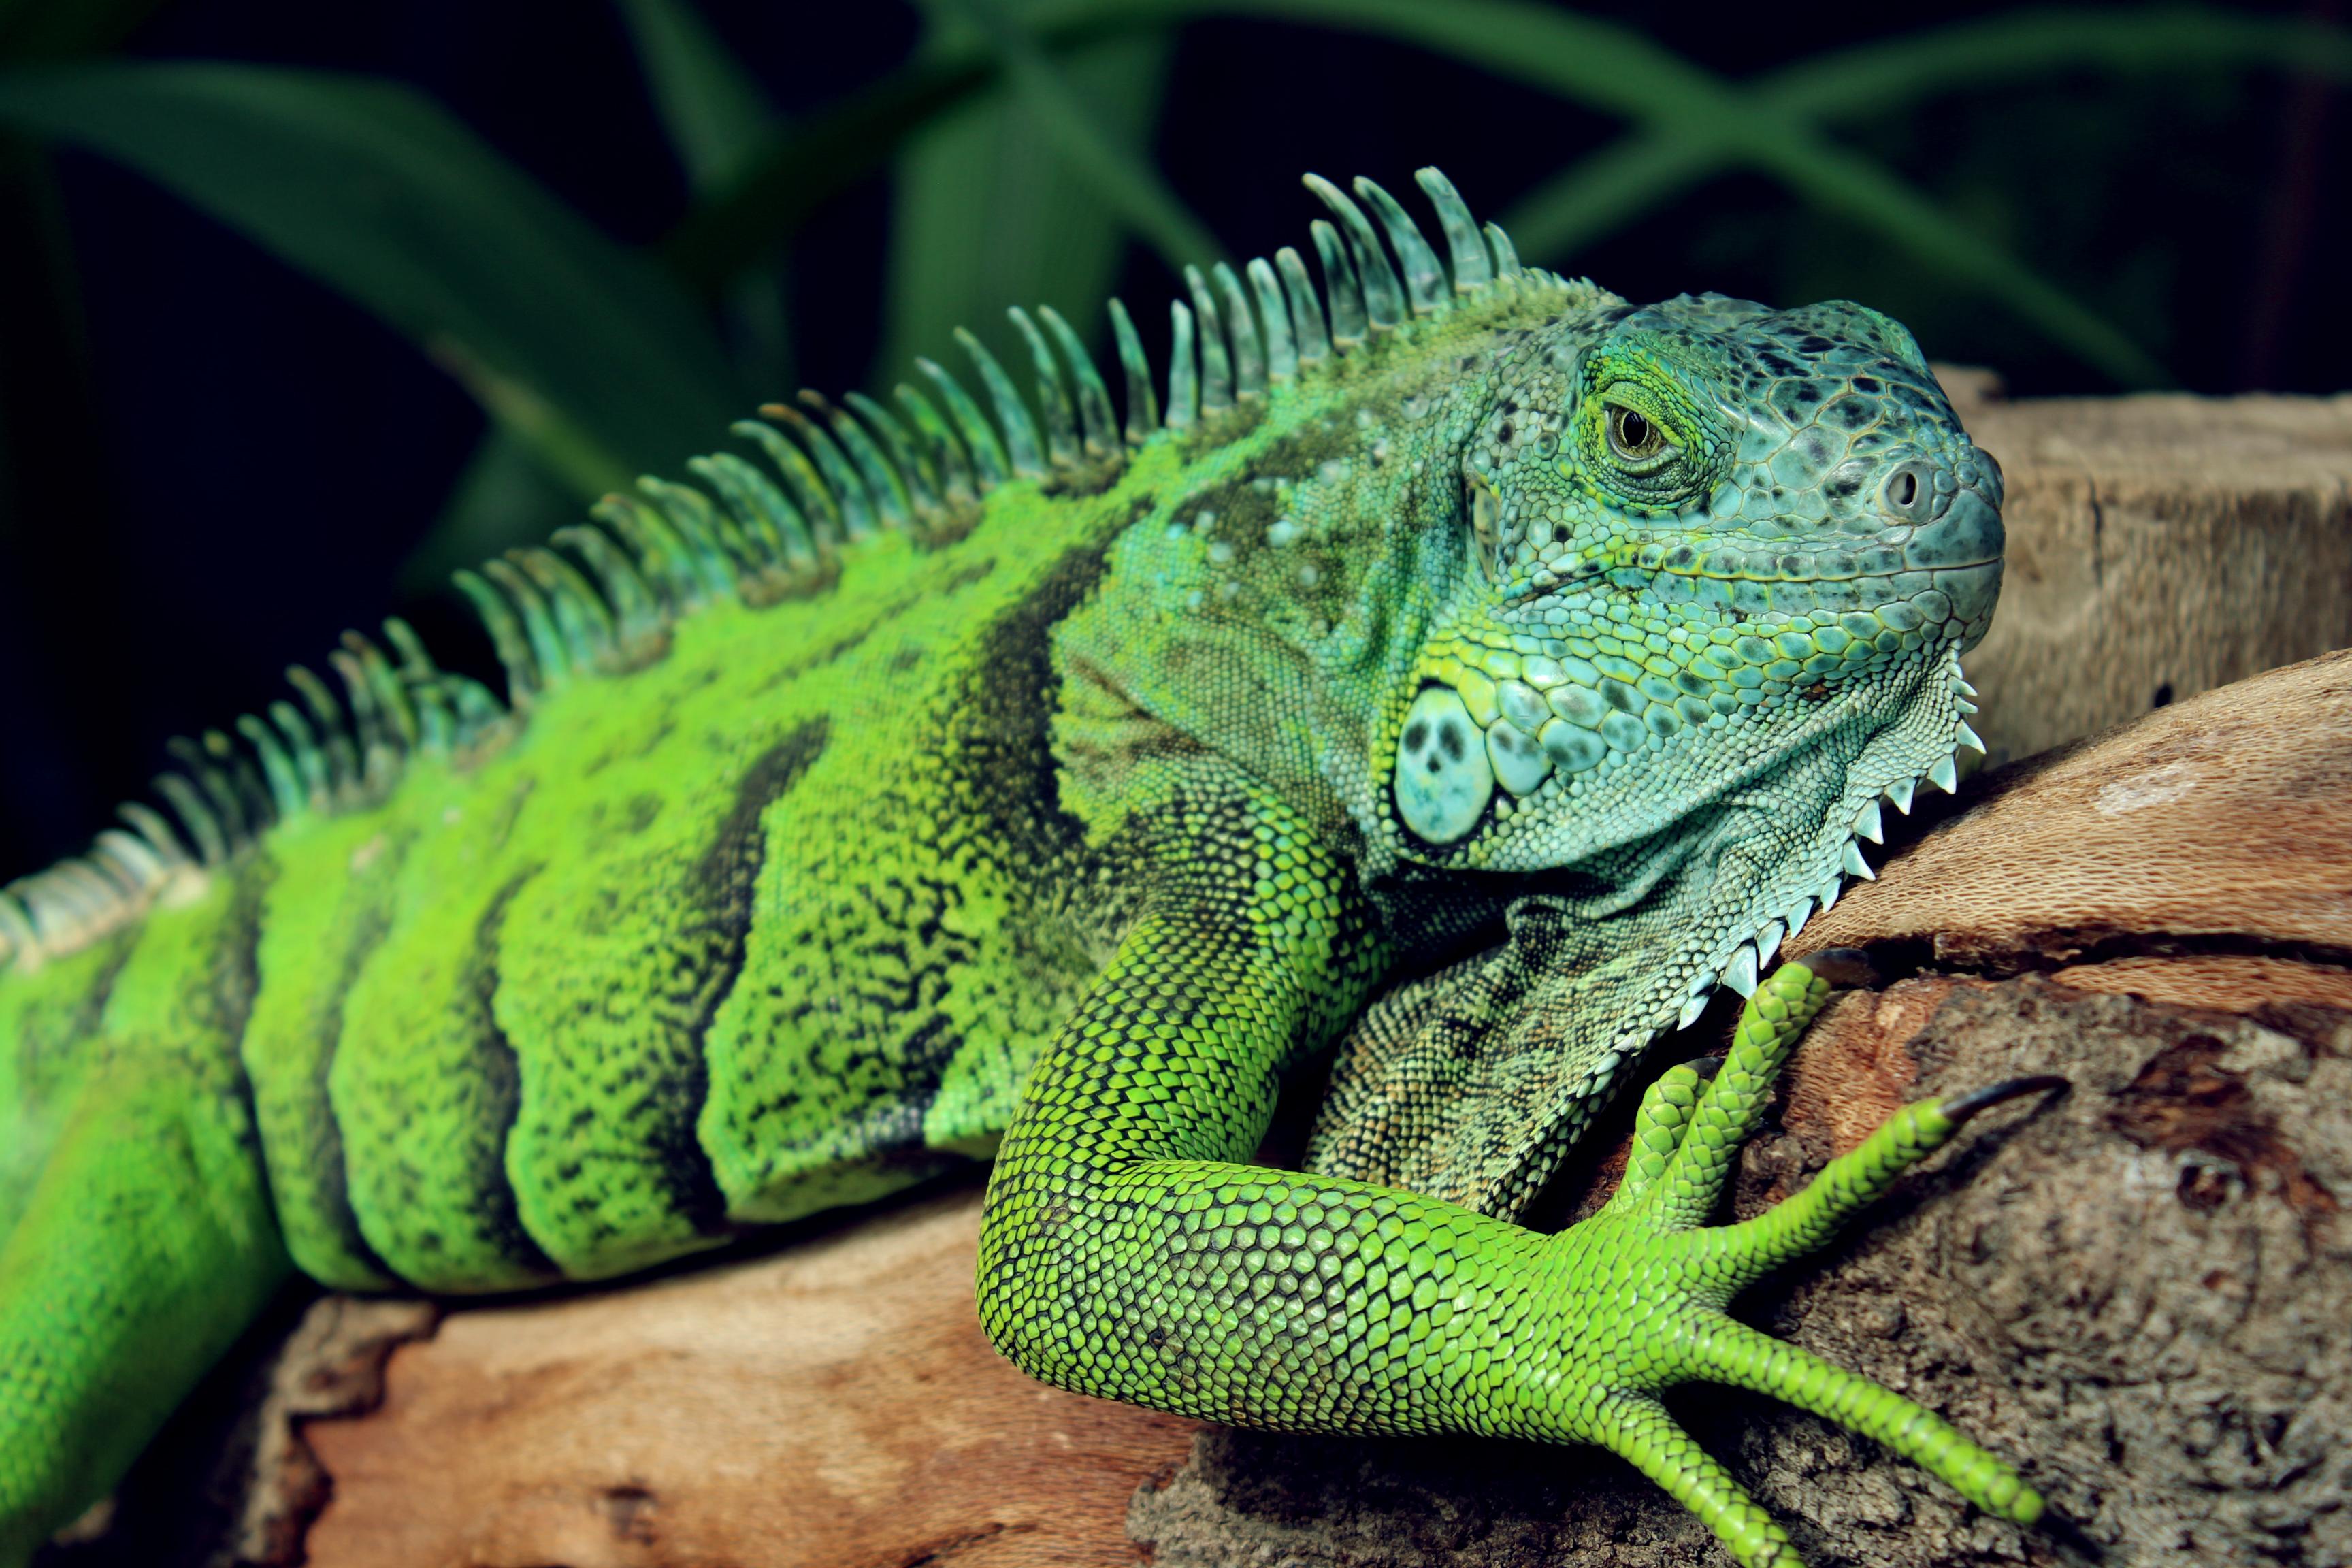 HD Quality Wallpaper | Collection: Animal, 3456x2304 Lizard